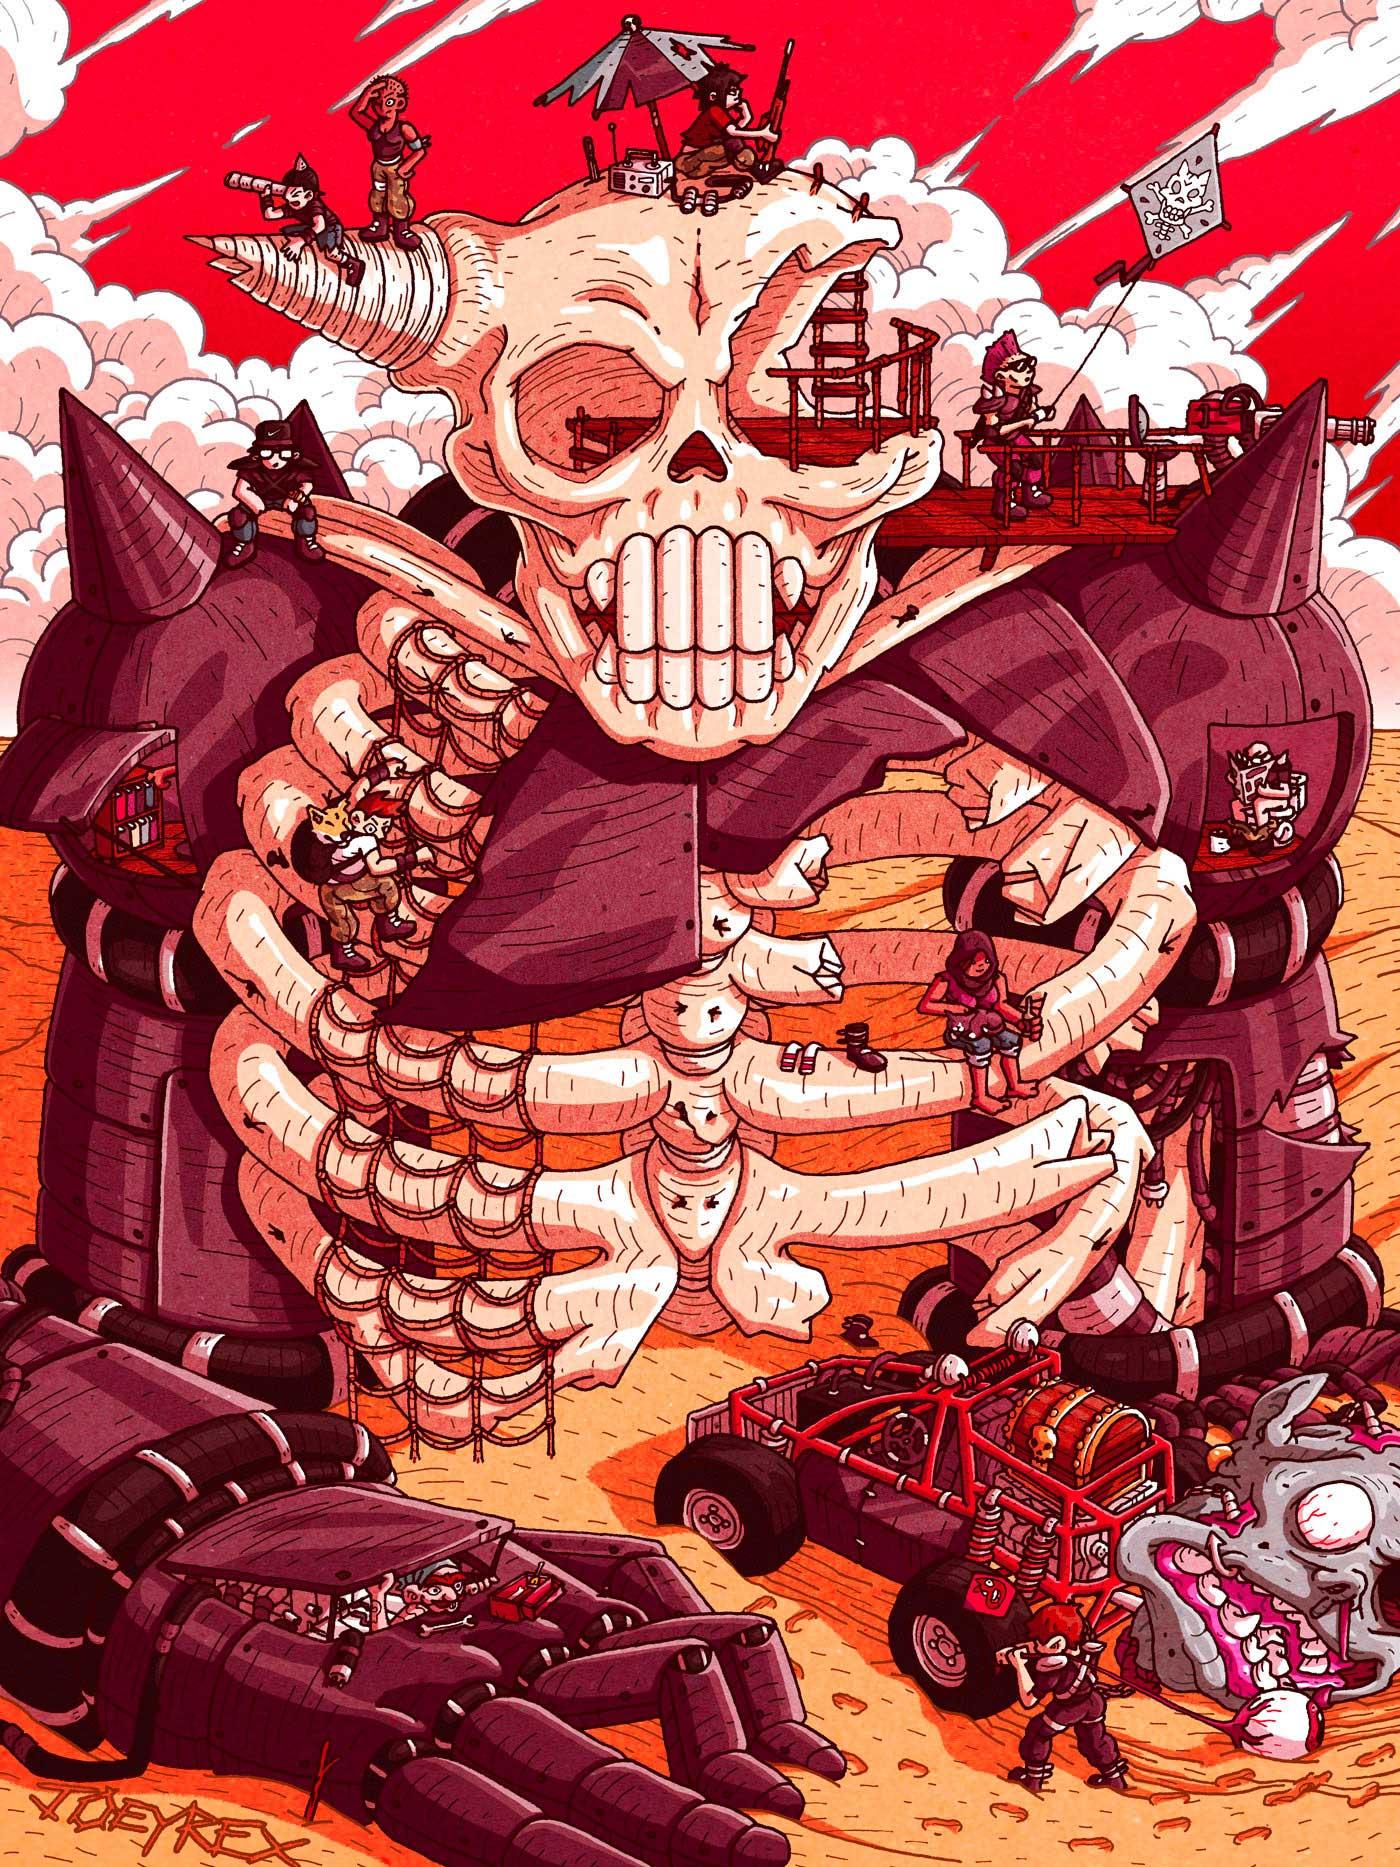 Illustration: Joey Rex Cardenas Joey-Rex-Cardenas_illustration_05